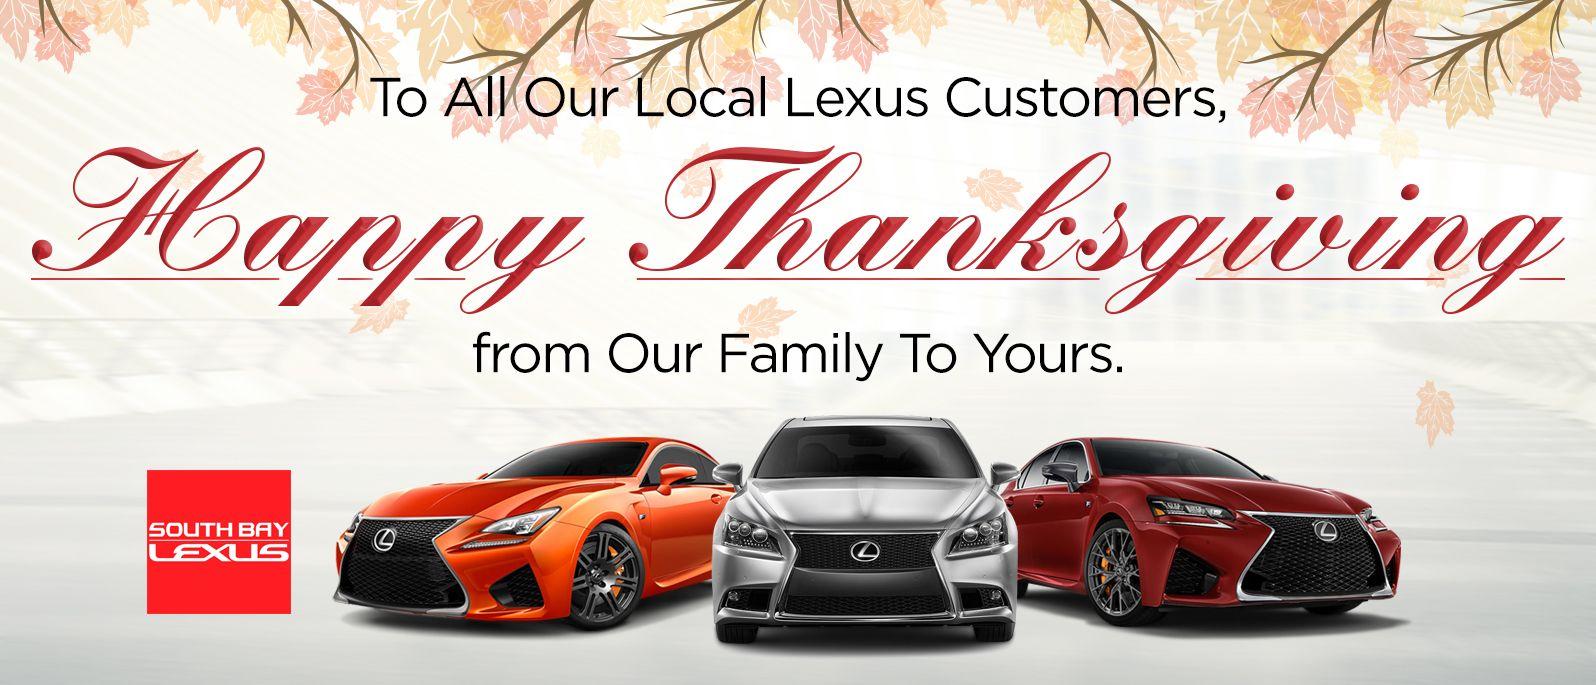 18 Lexus Sales Events Ideas In 2021 Lexus Lexus Dealer South Bay